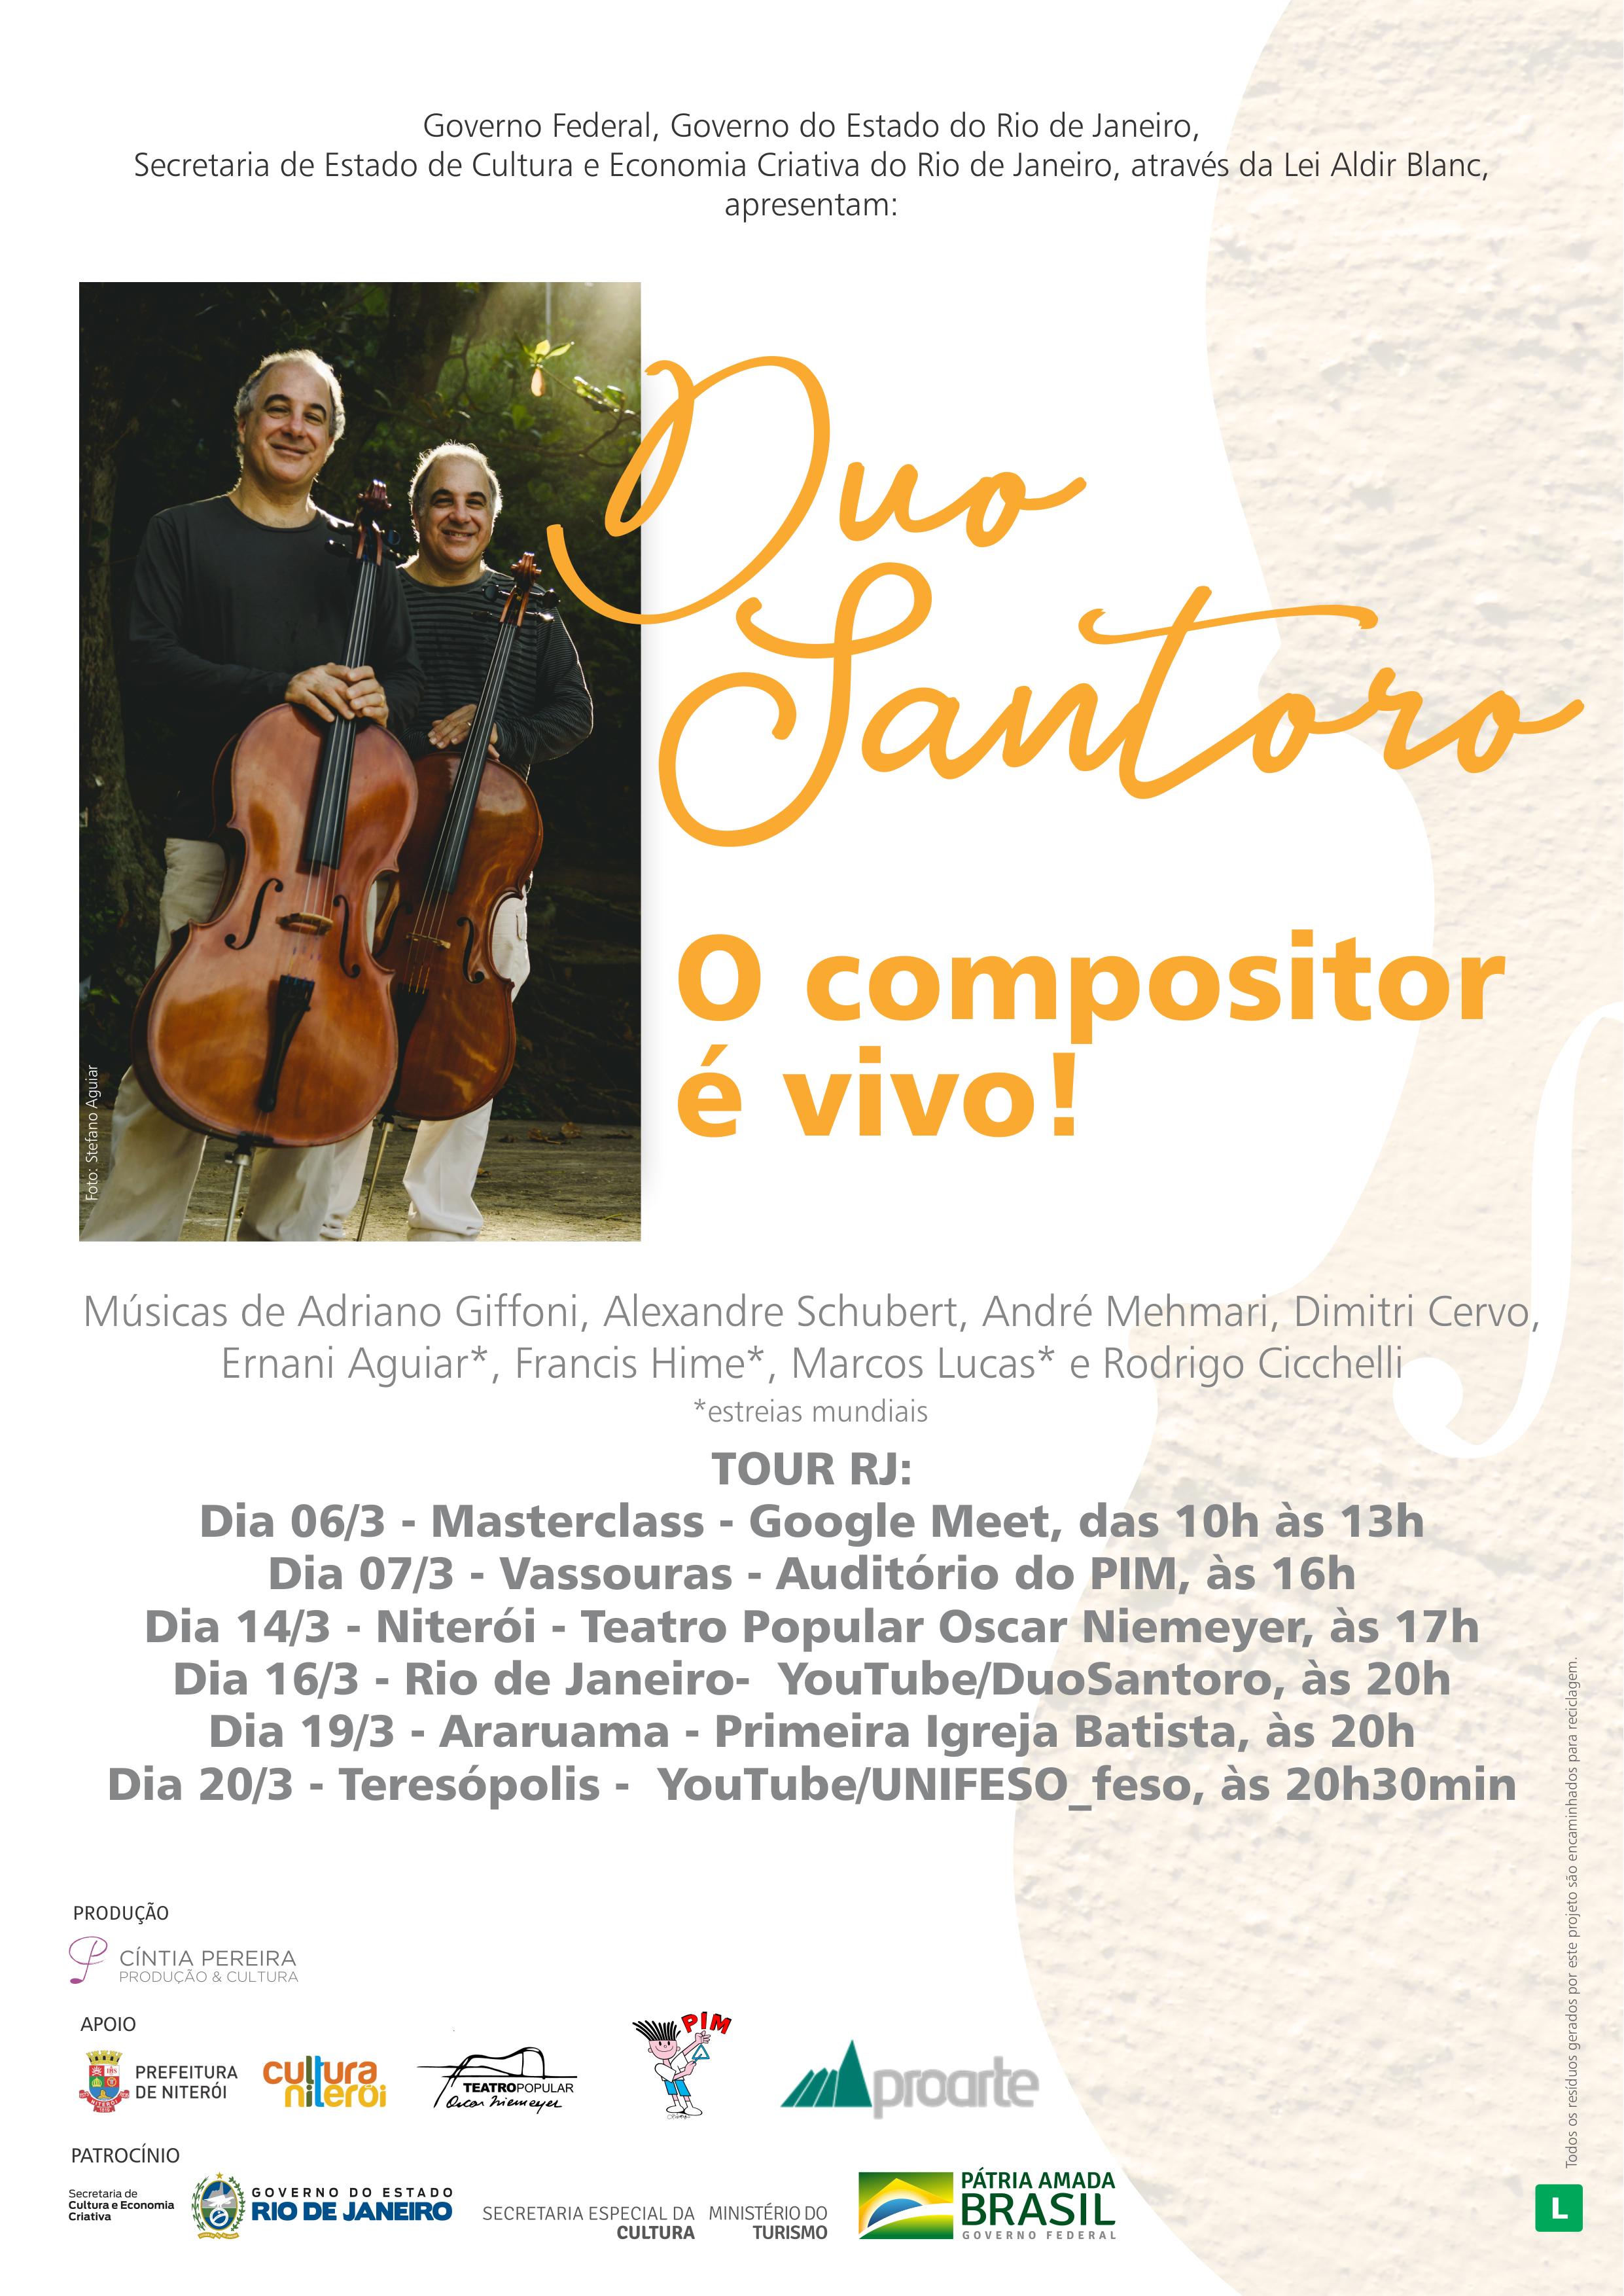 TOUR RJ DUO SANTORO - O compositor é vivo!